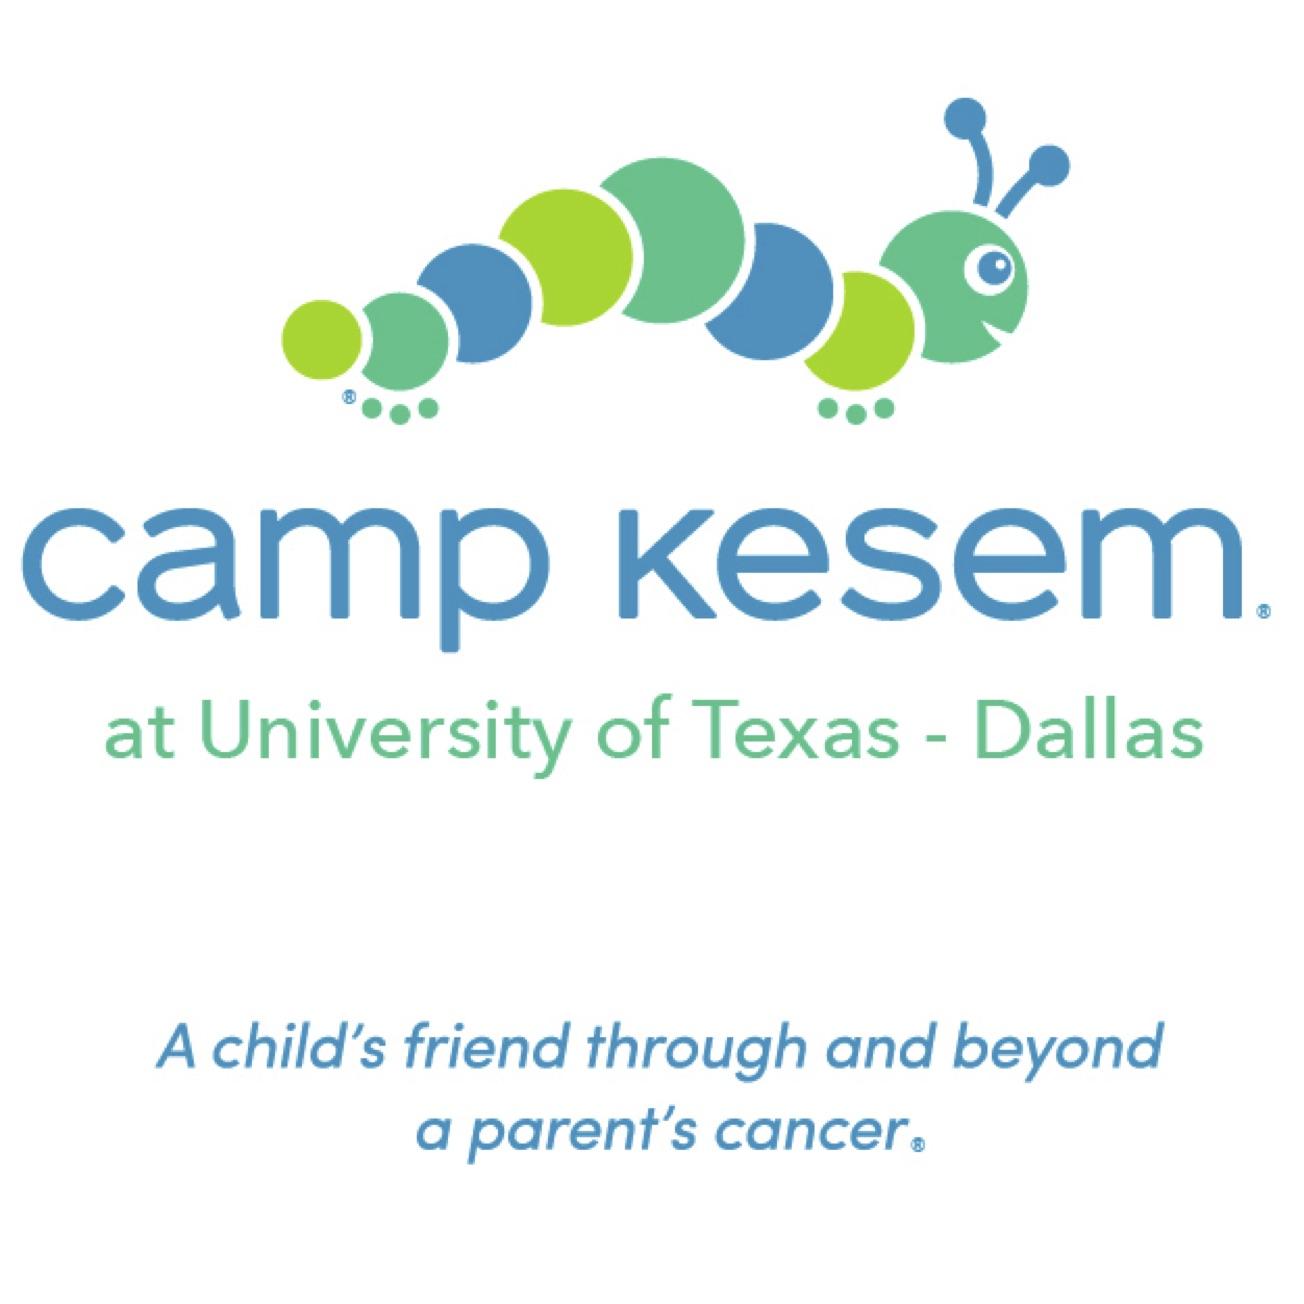 Camp Kesem at University of Texas - Dallas